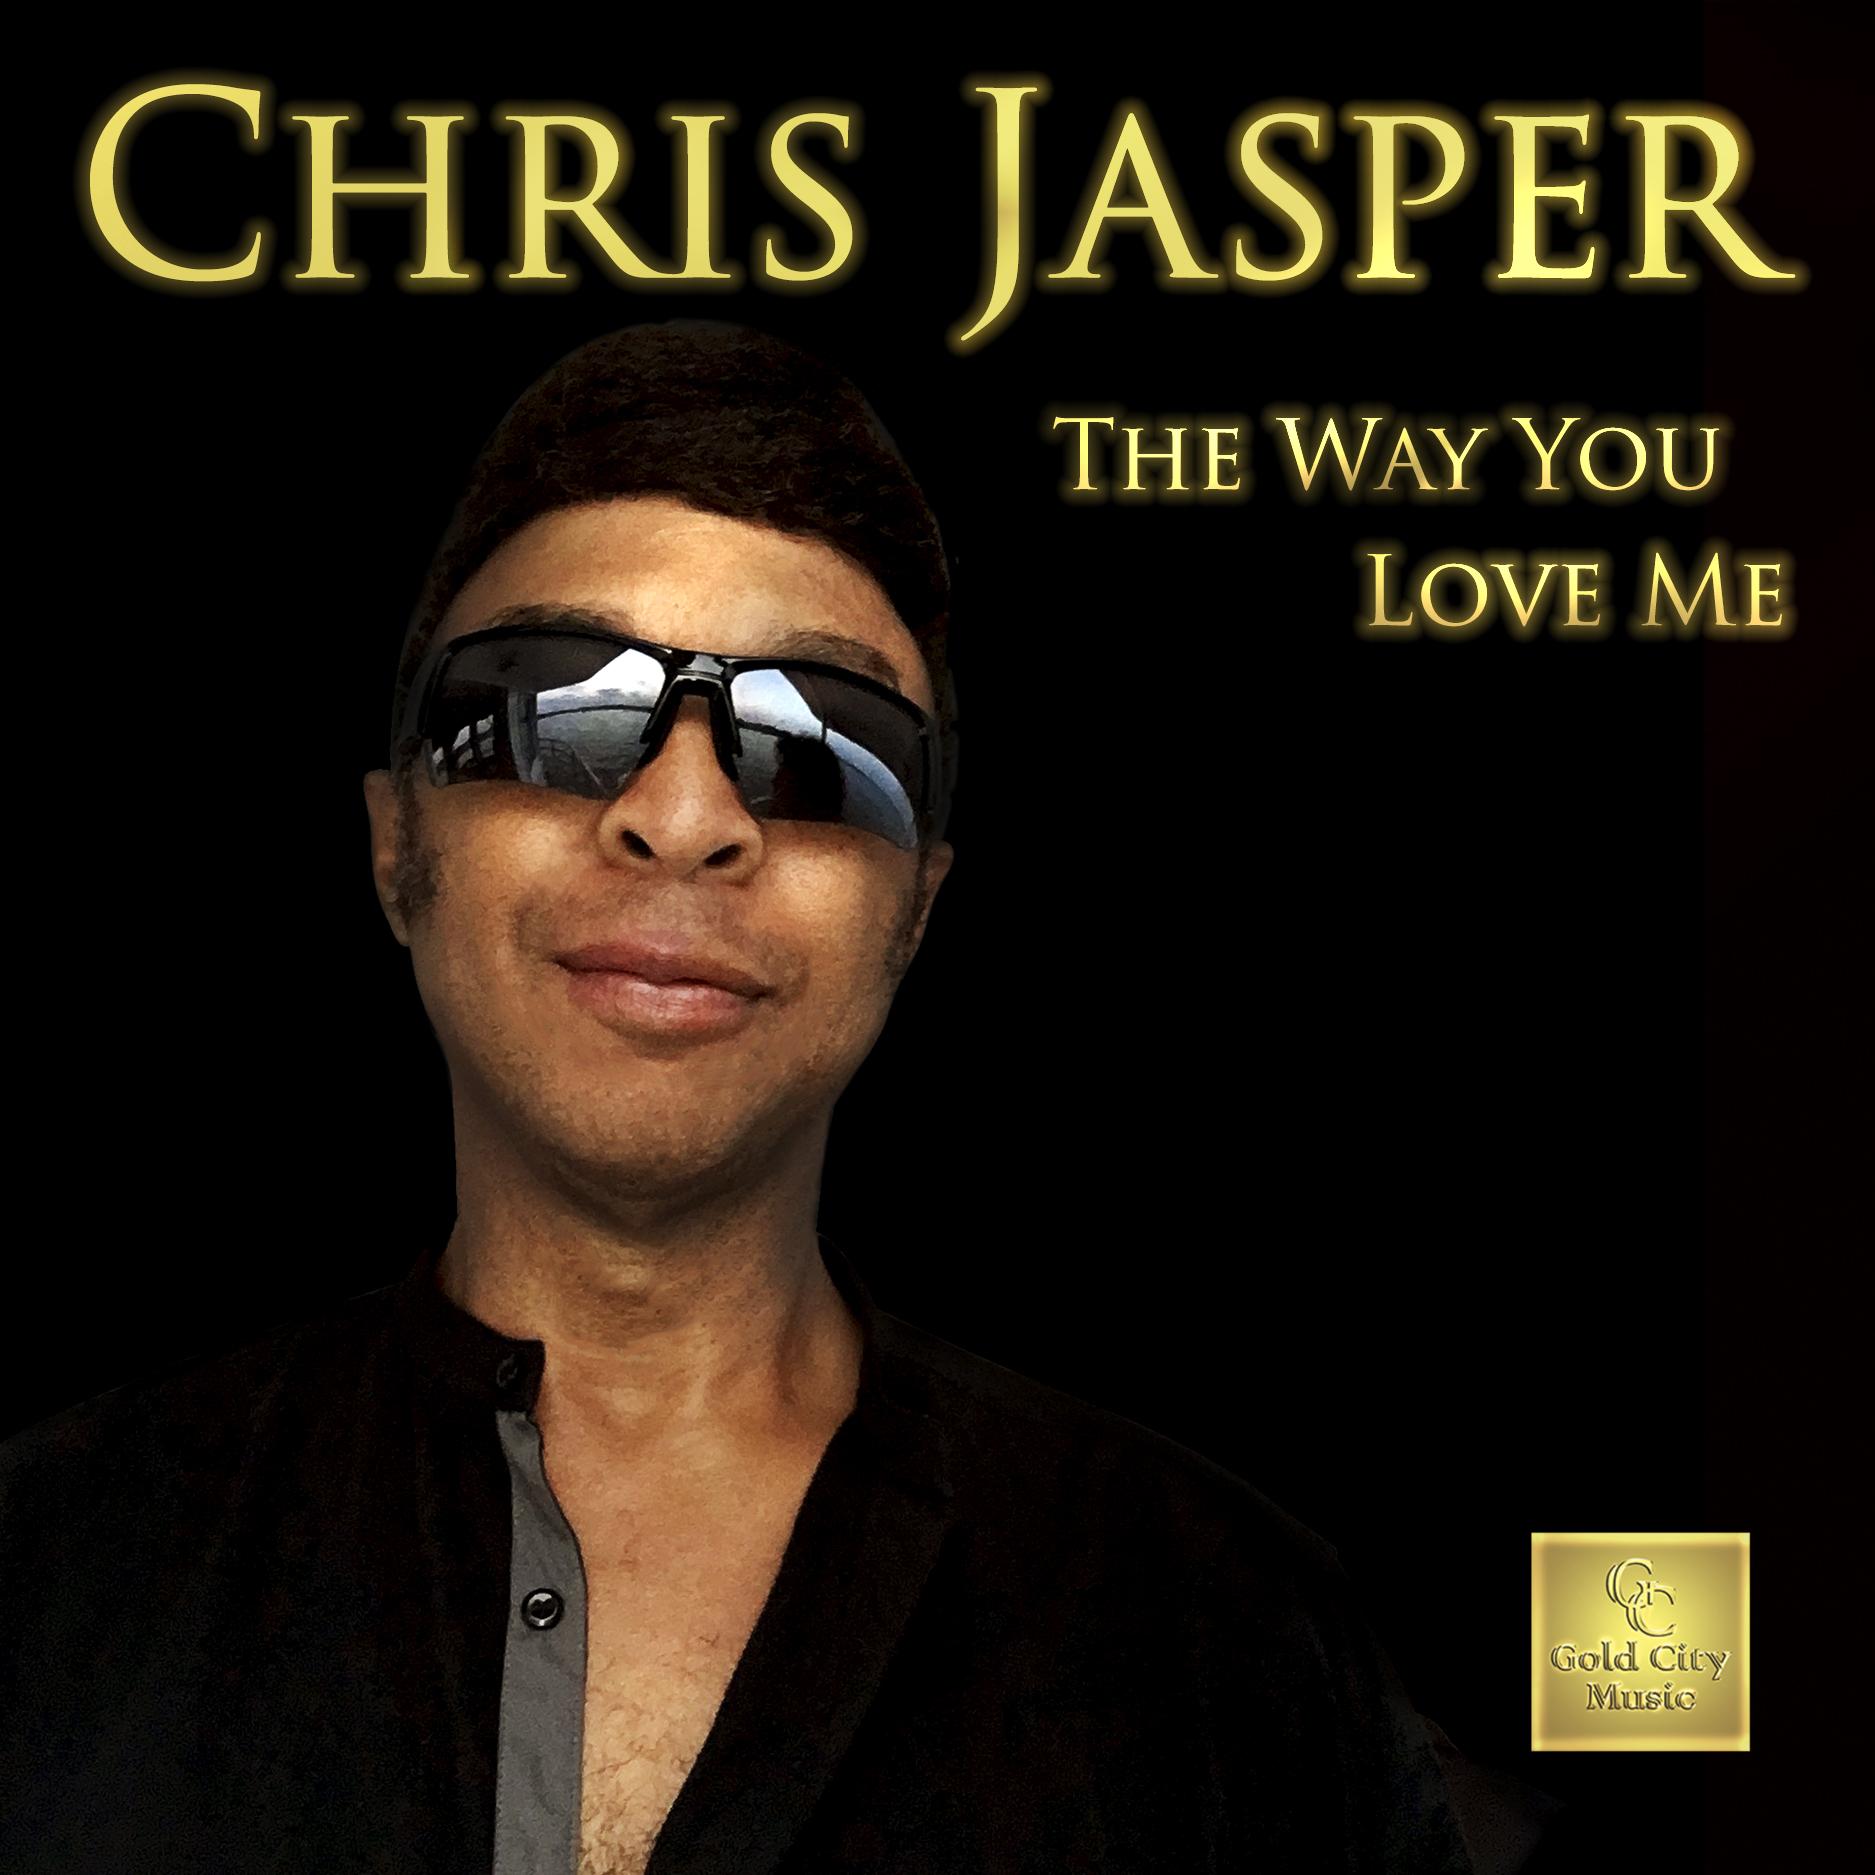 https://0201.nccdn.net/4_2/000/000/03f/ac7/chrisjasper_288193-the_way_you_love_me_21stcenturyartists.jpg